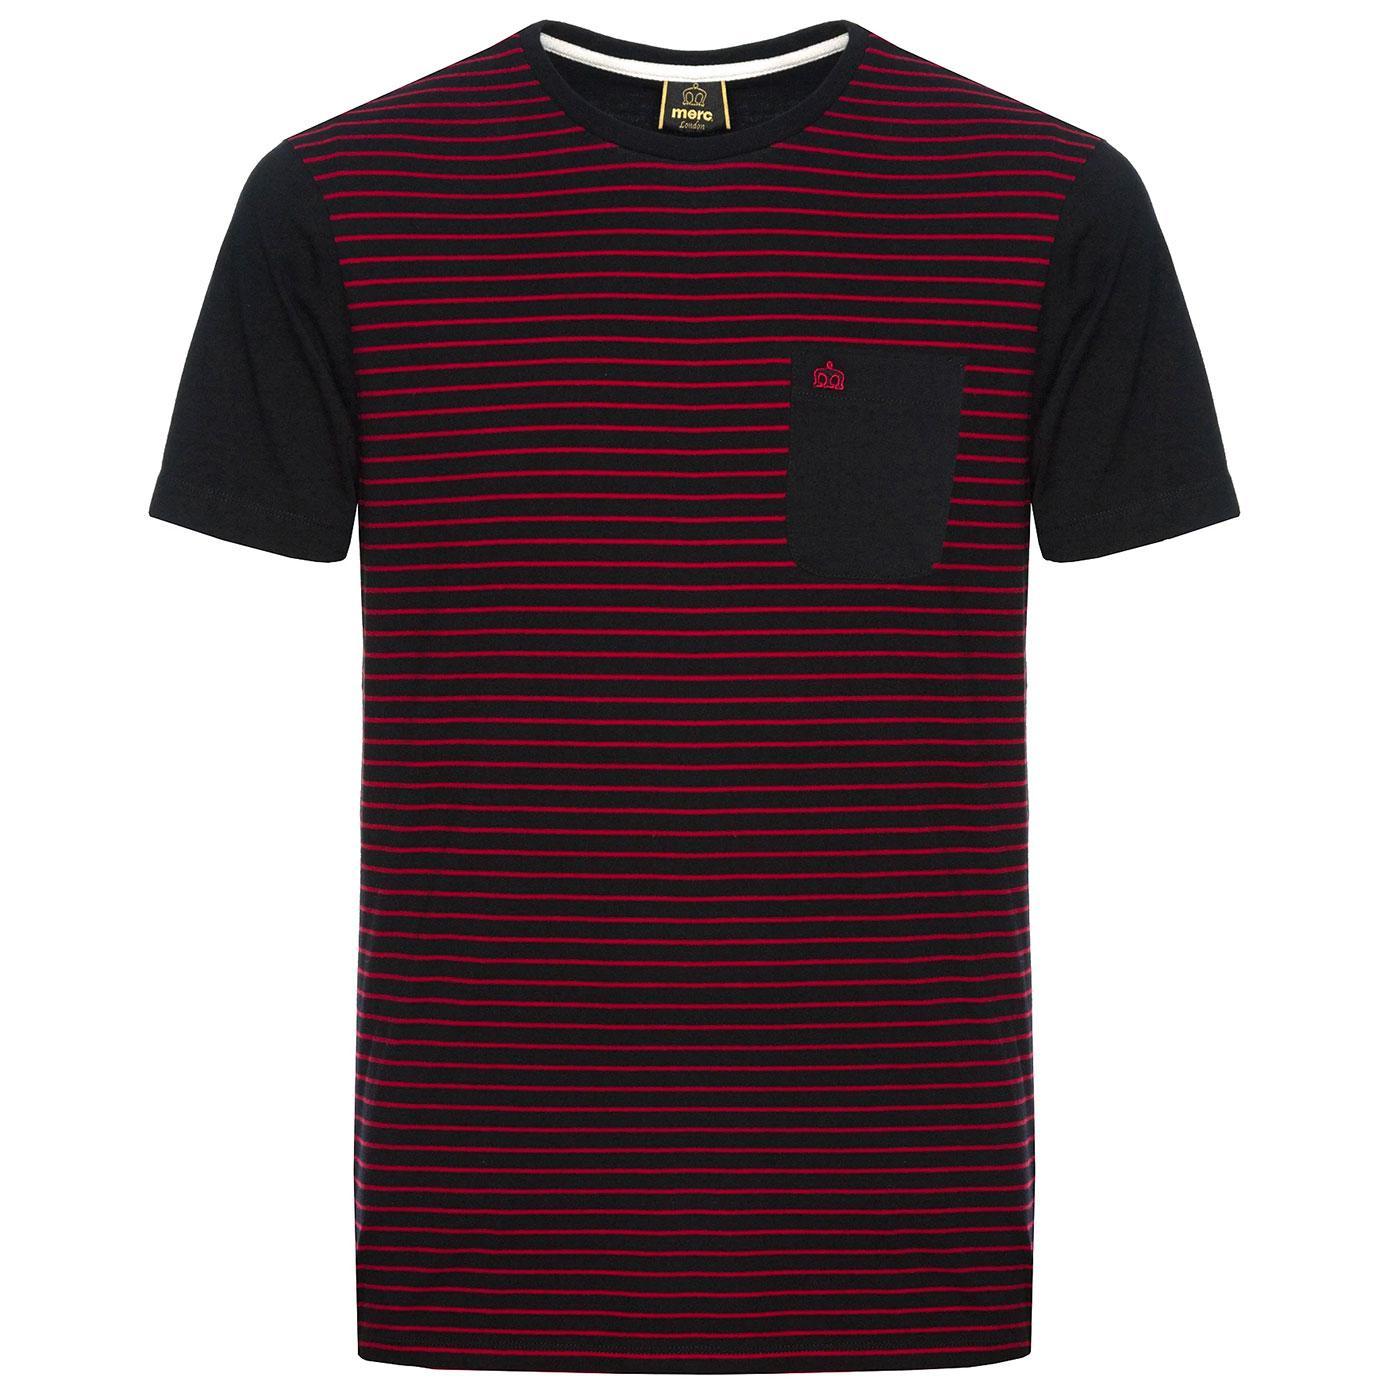 Eaton MERC Retro 70s Fine Stripe T-Shirt in Black